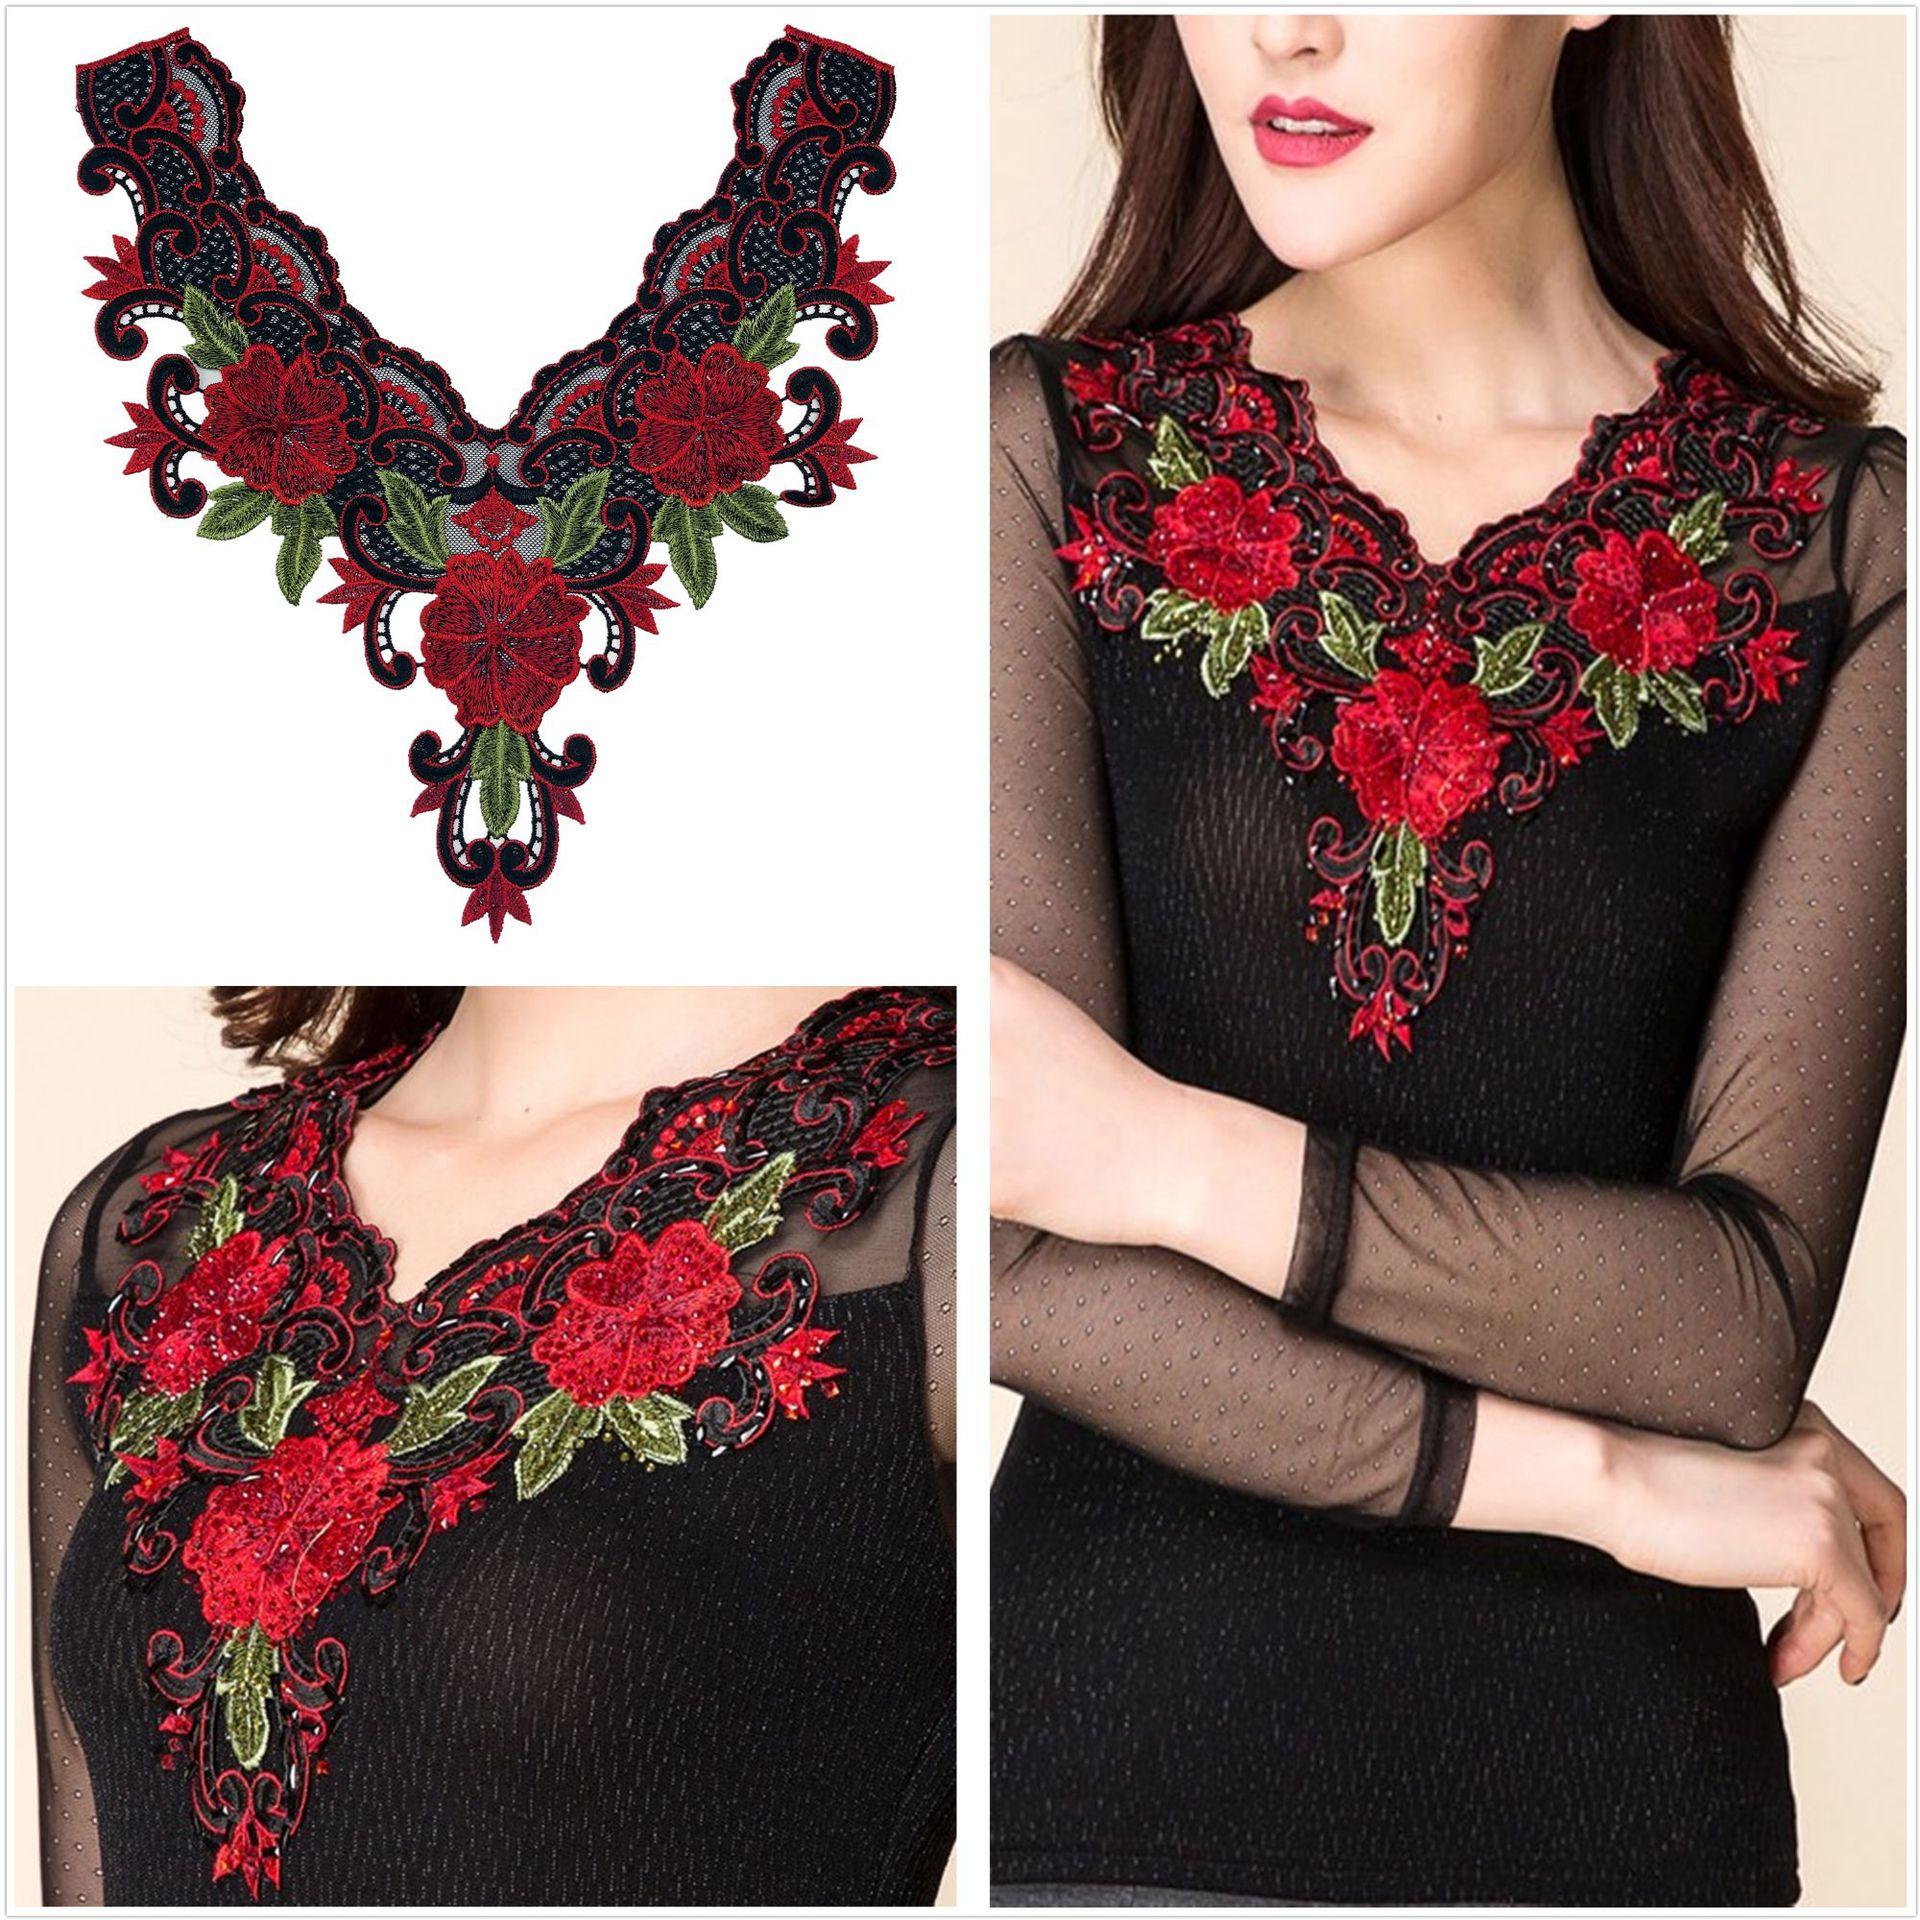 Godier Fashion Motifs Neck Applique Flower Embroidery Patches Lace Fabric Diy